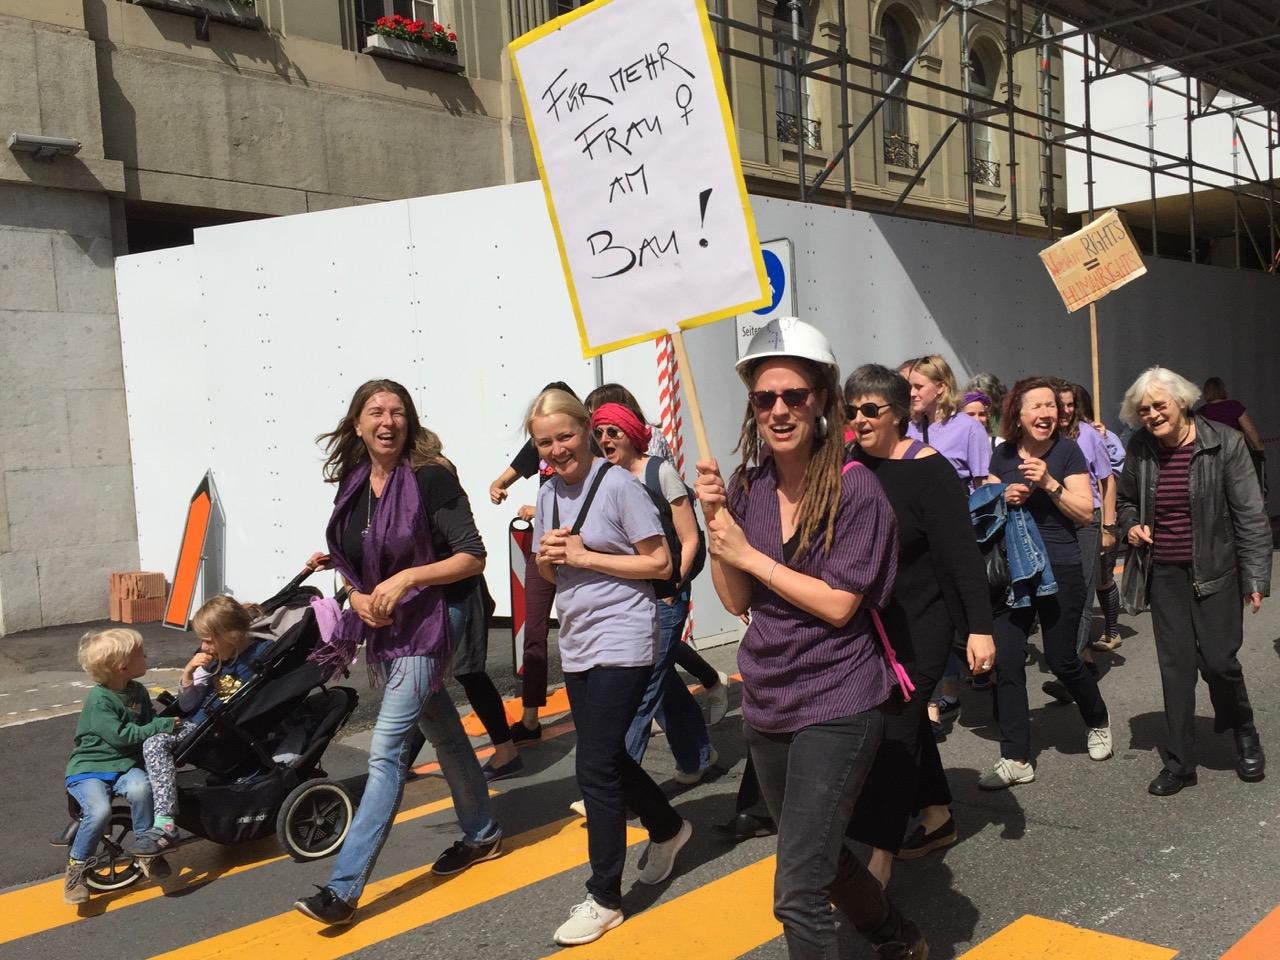 ABAP am Frauenstreik 14.6.19 - 2